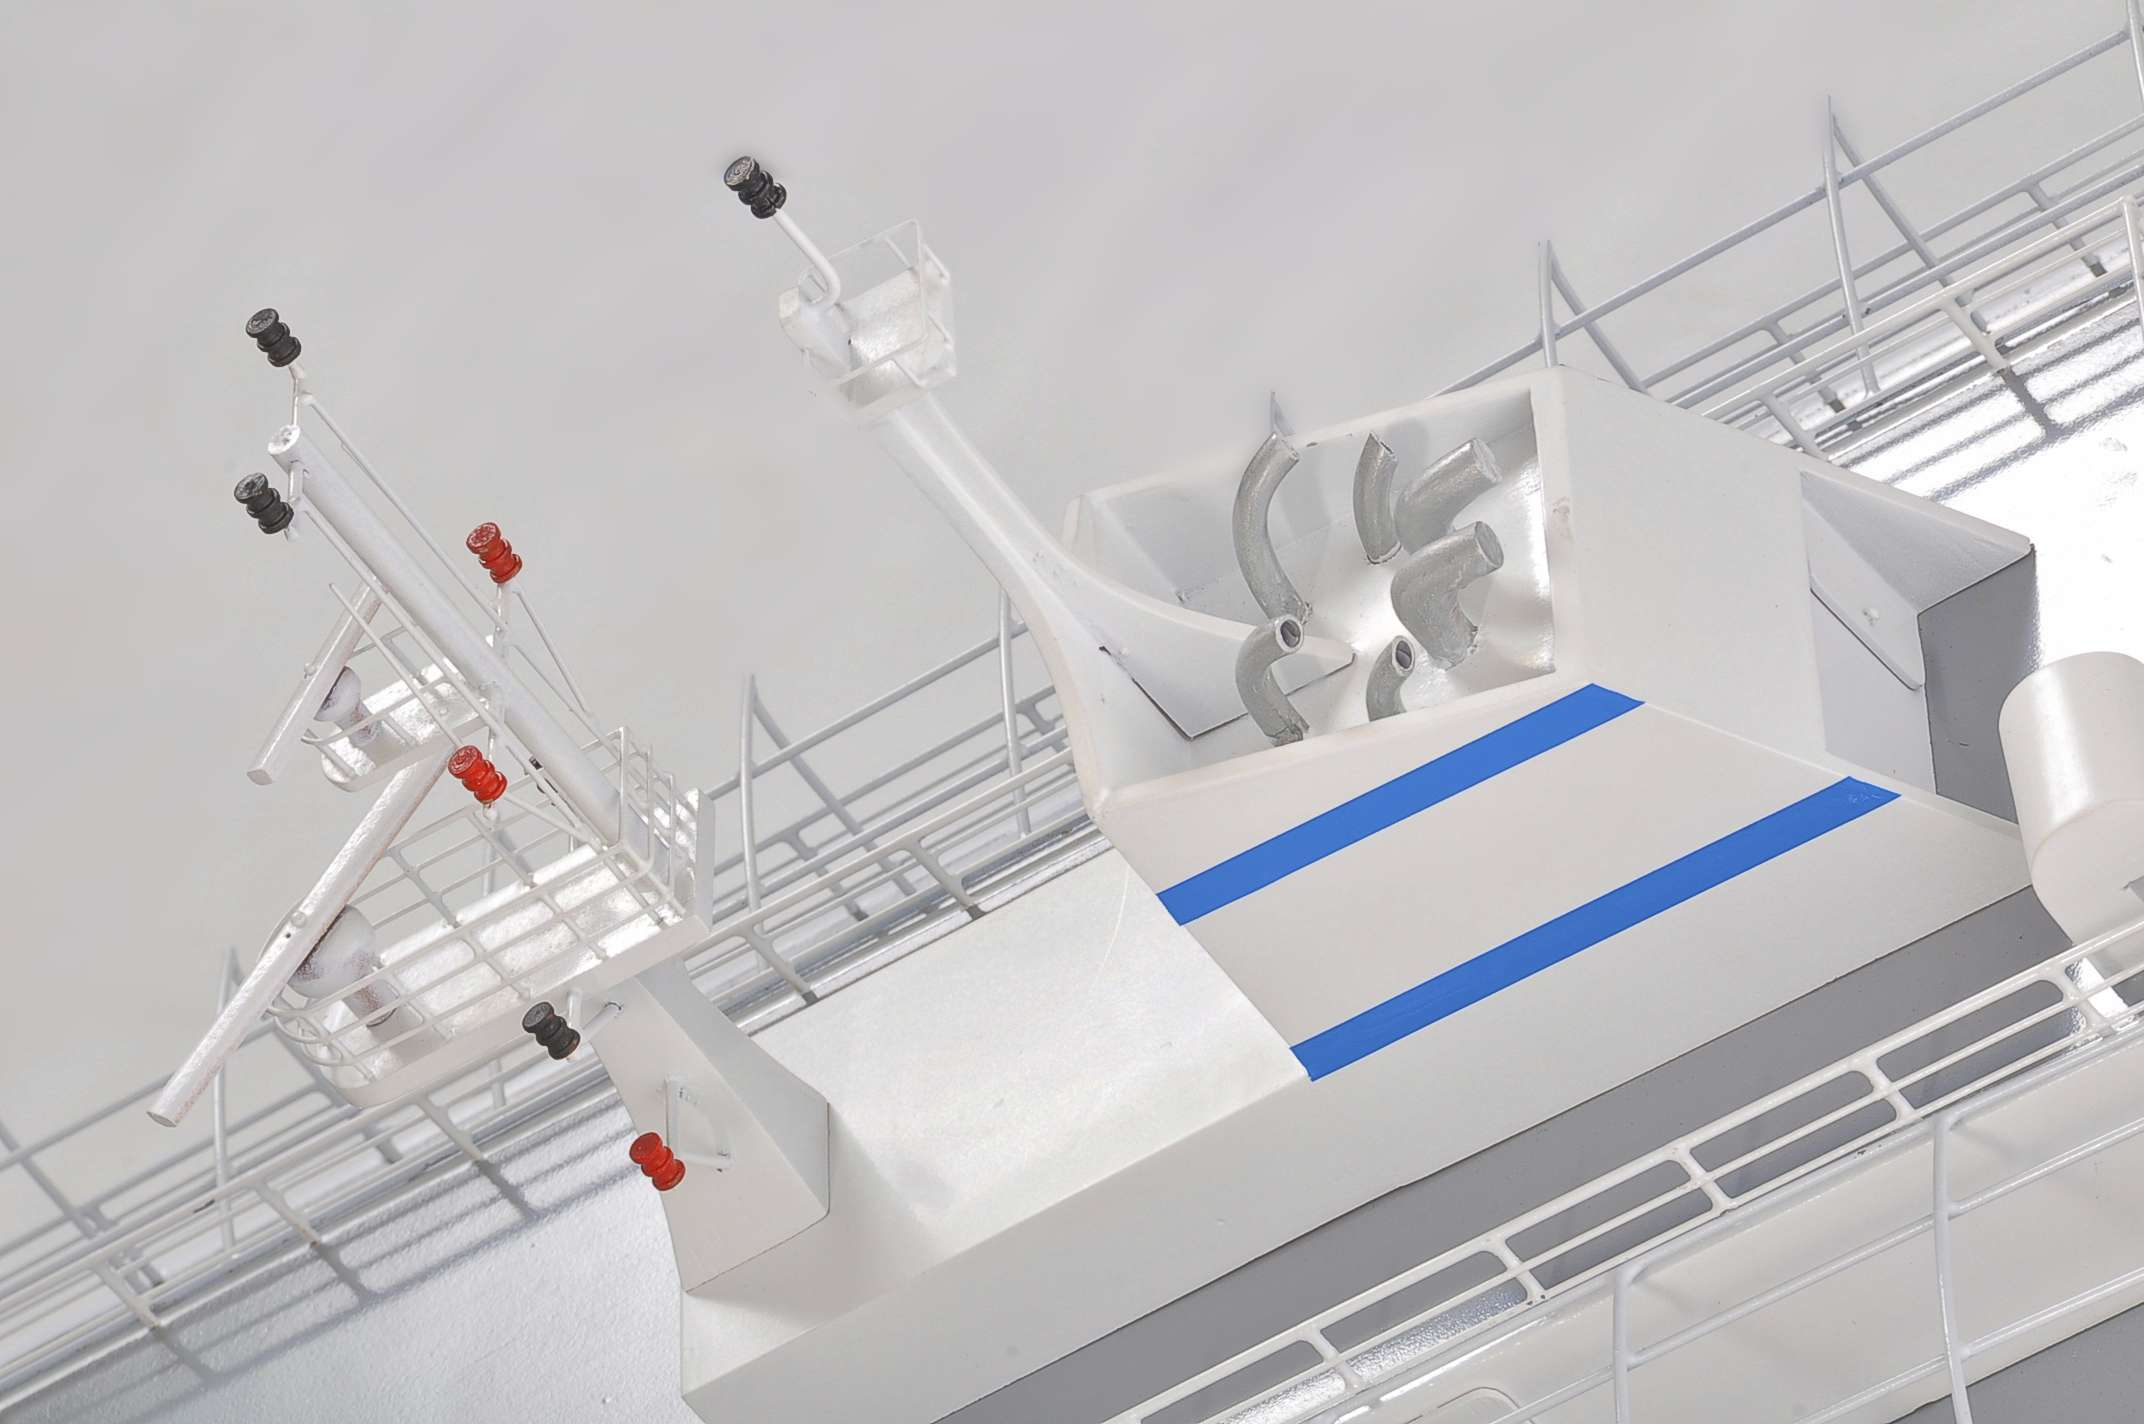 1477-4352-MV-Corals-Cargo-Vessel